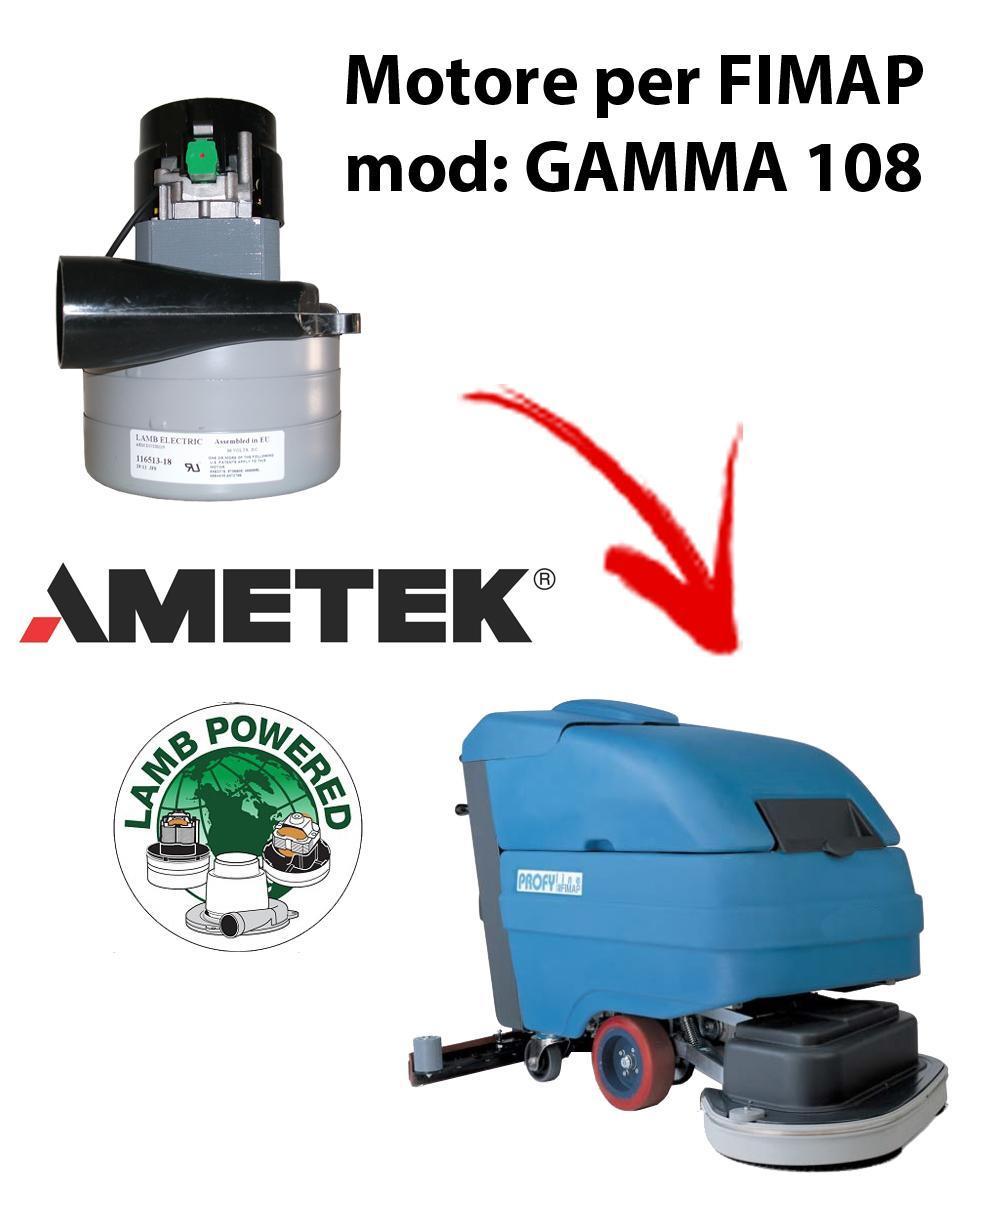 GAMMA 108 Saugmotor AMETEK für scheuersaugmaschinen FIMAP